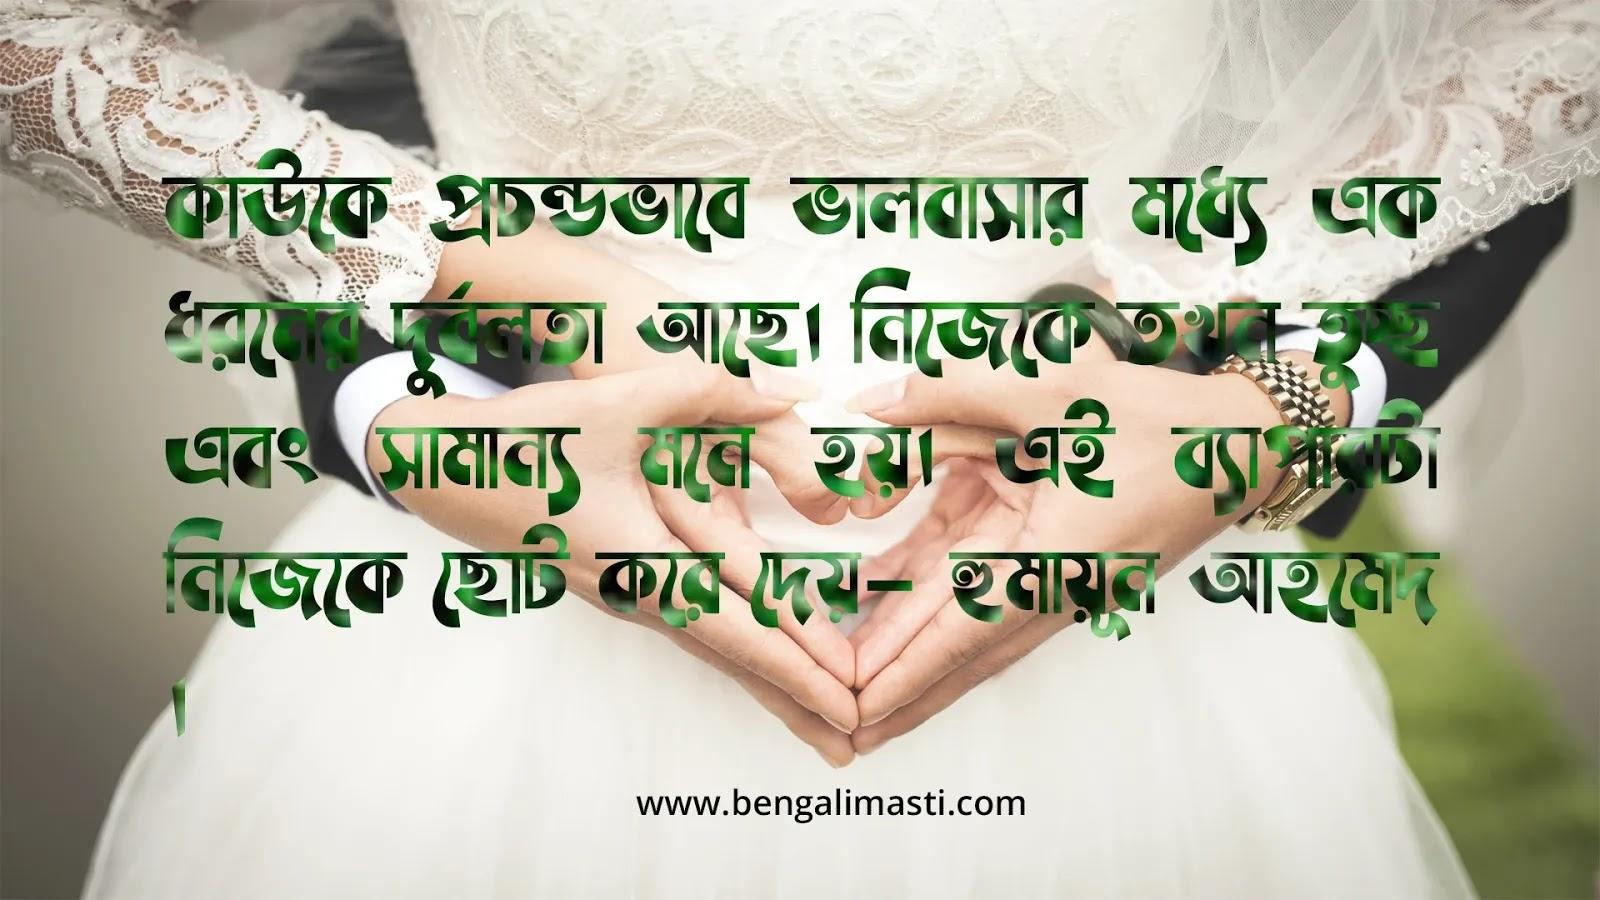 bengali sad quotes lyrics